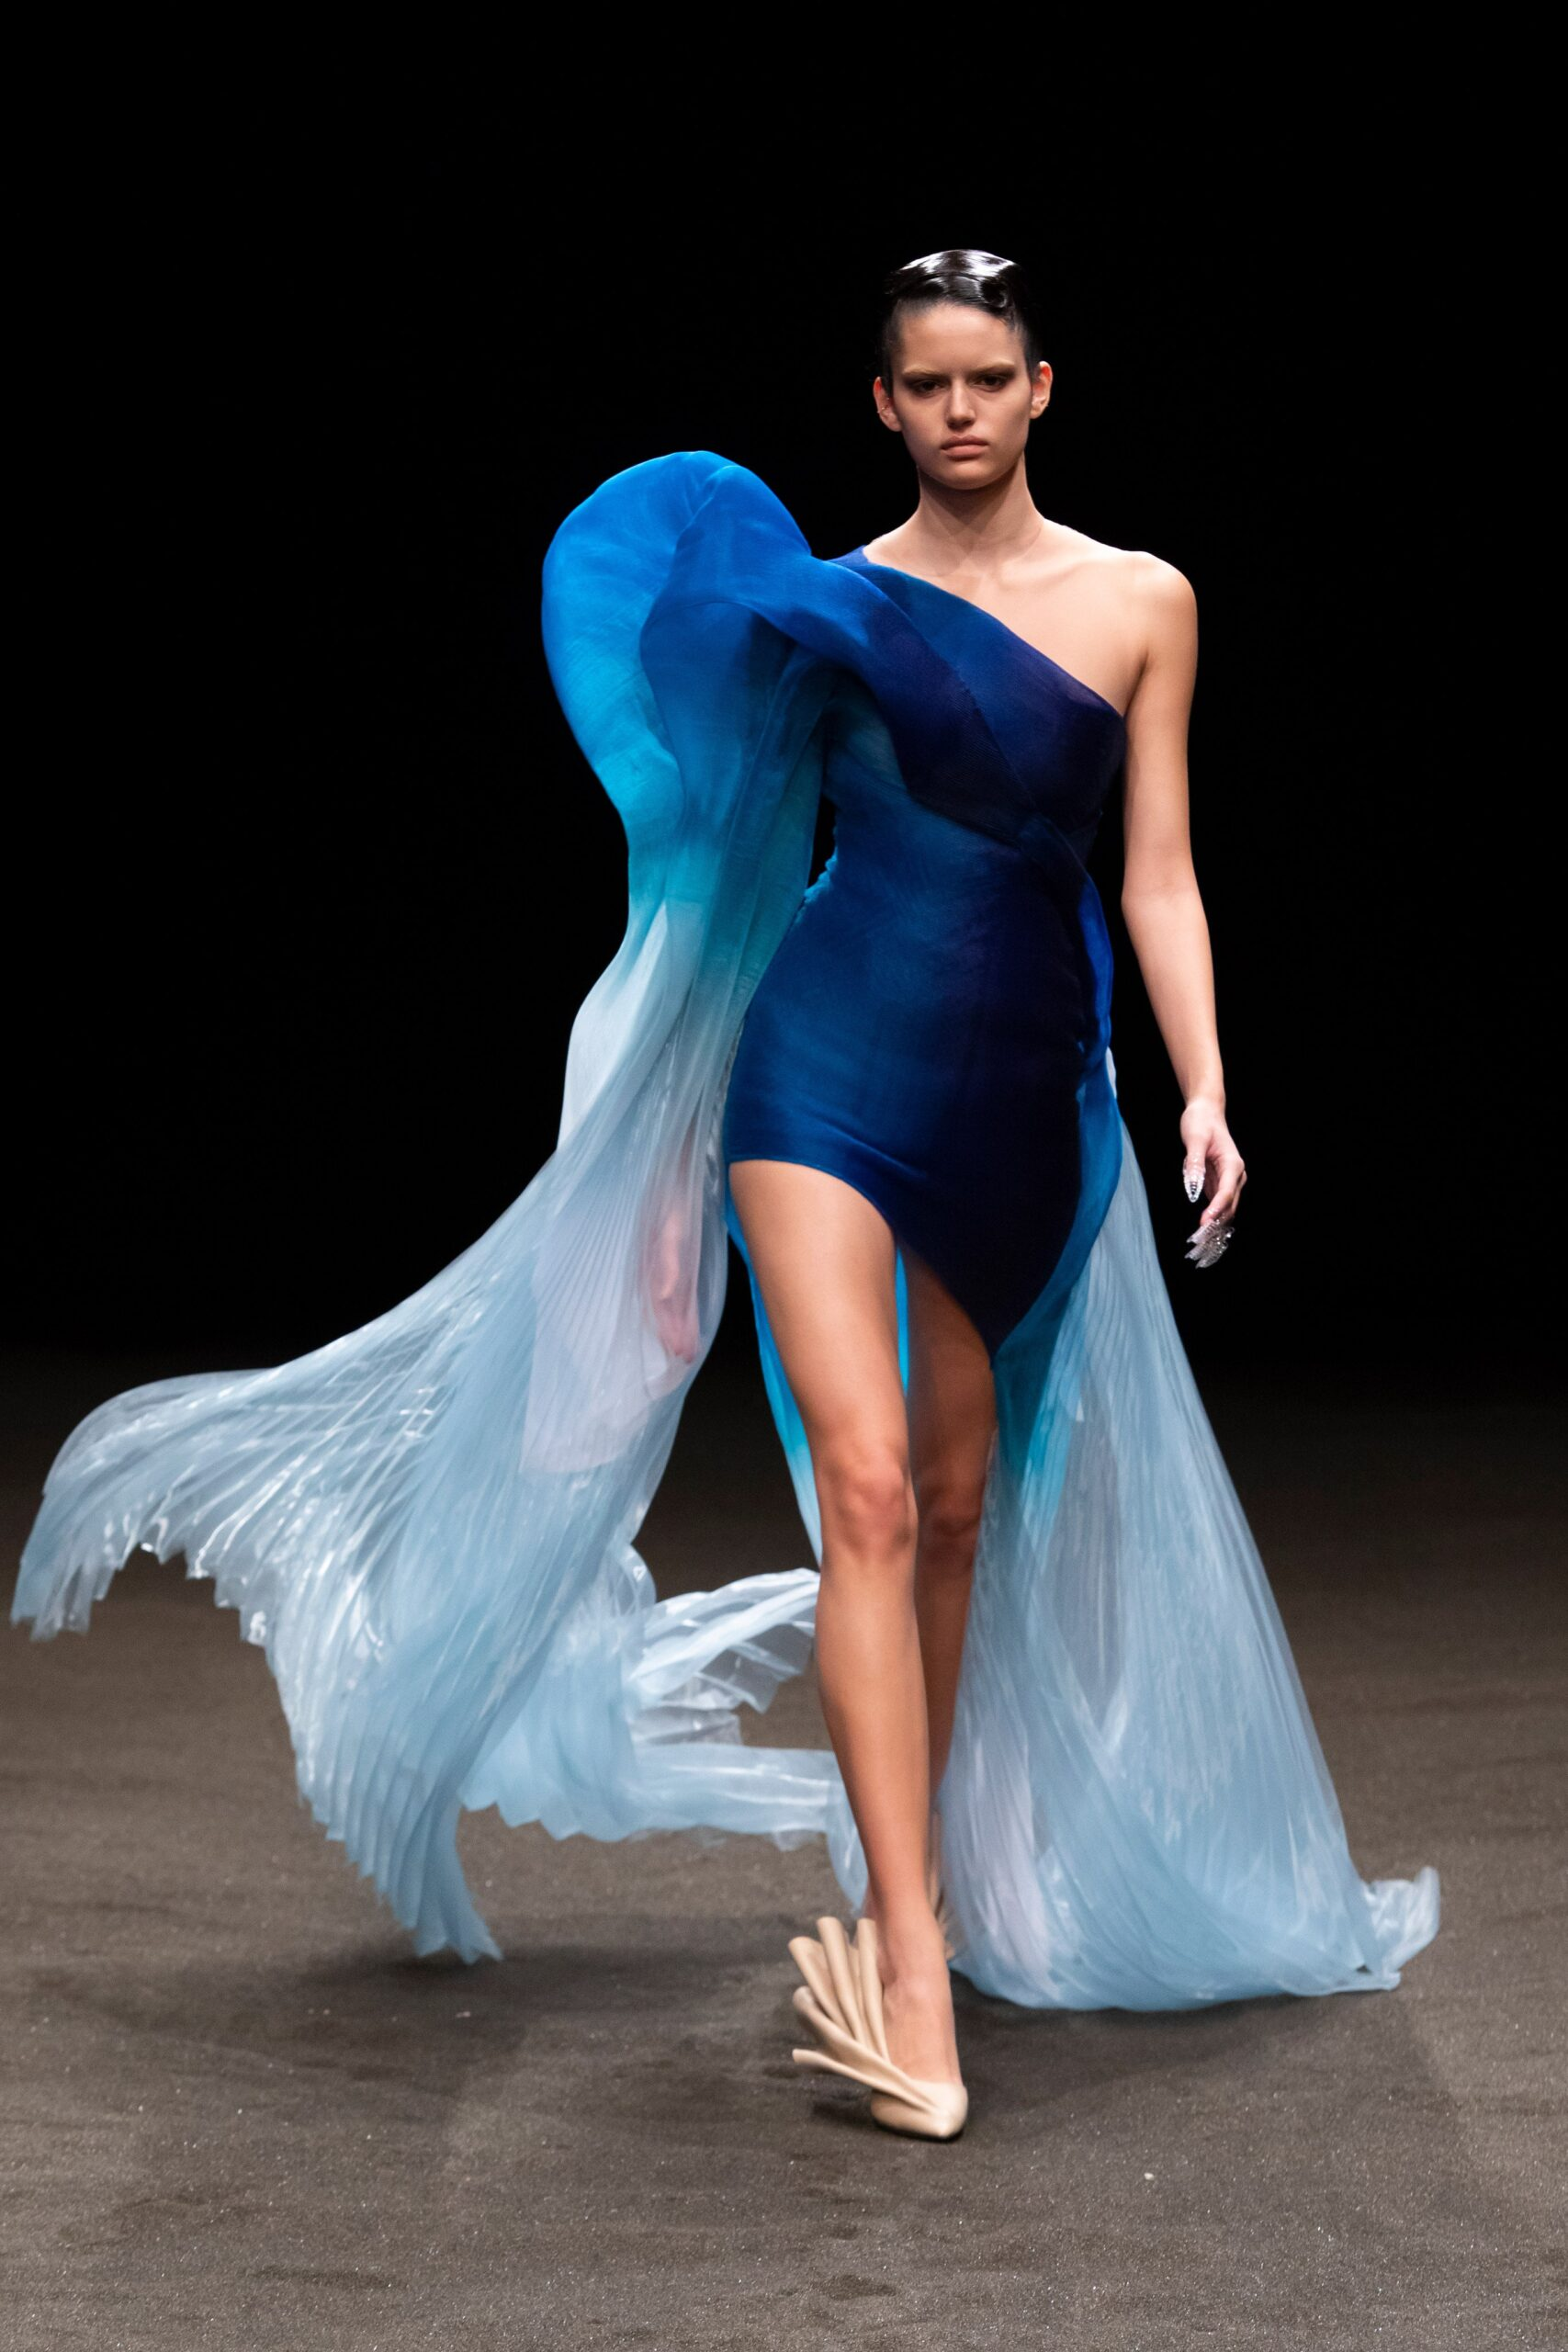 00009 Iris van Herpen Couture Spring 21 credit Gio Staiano